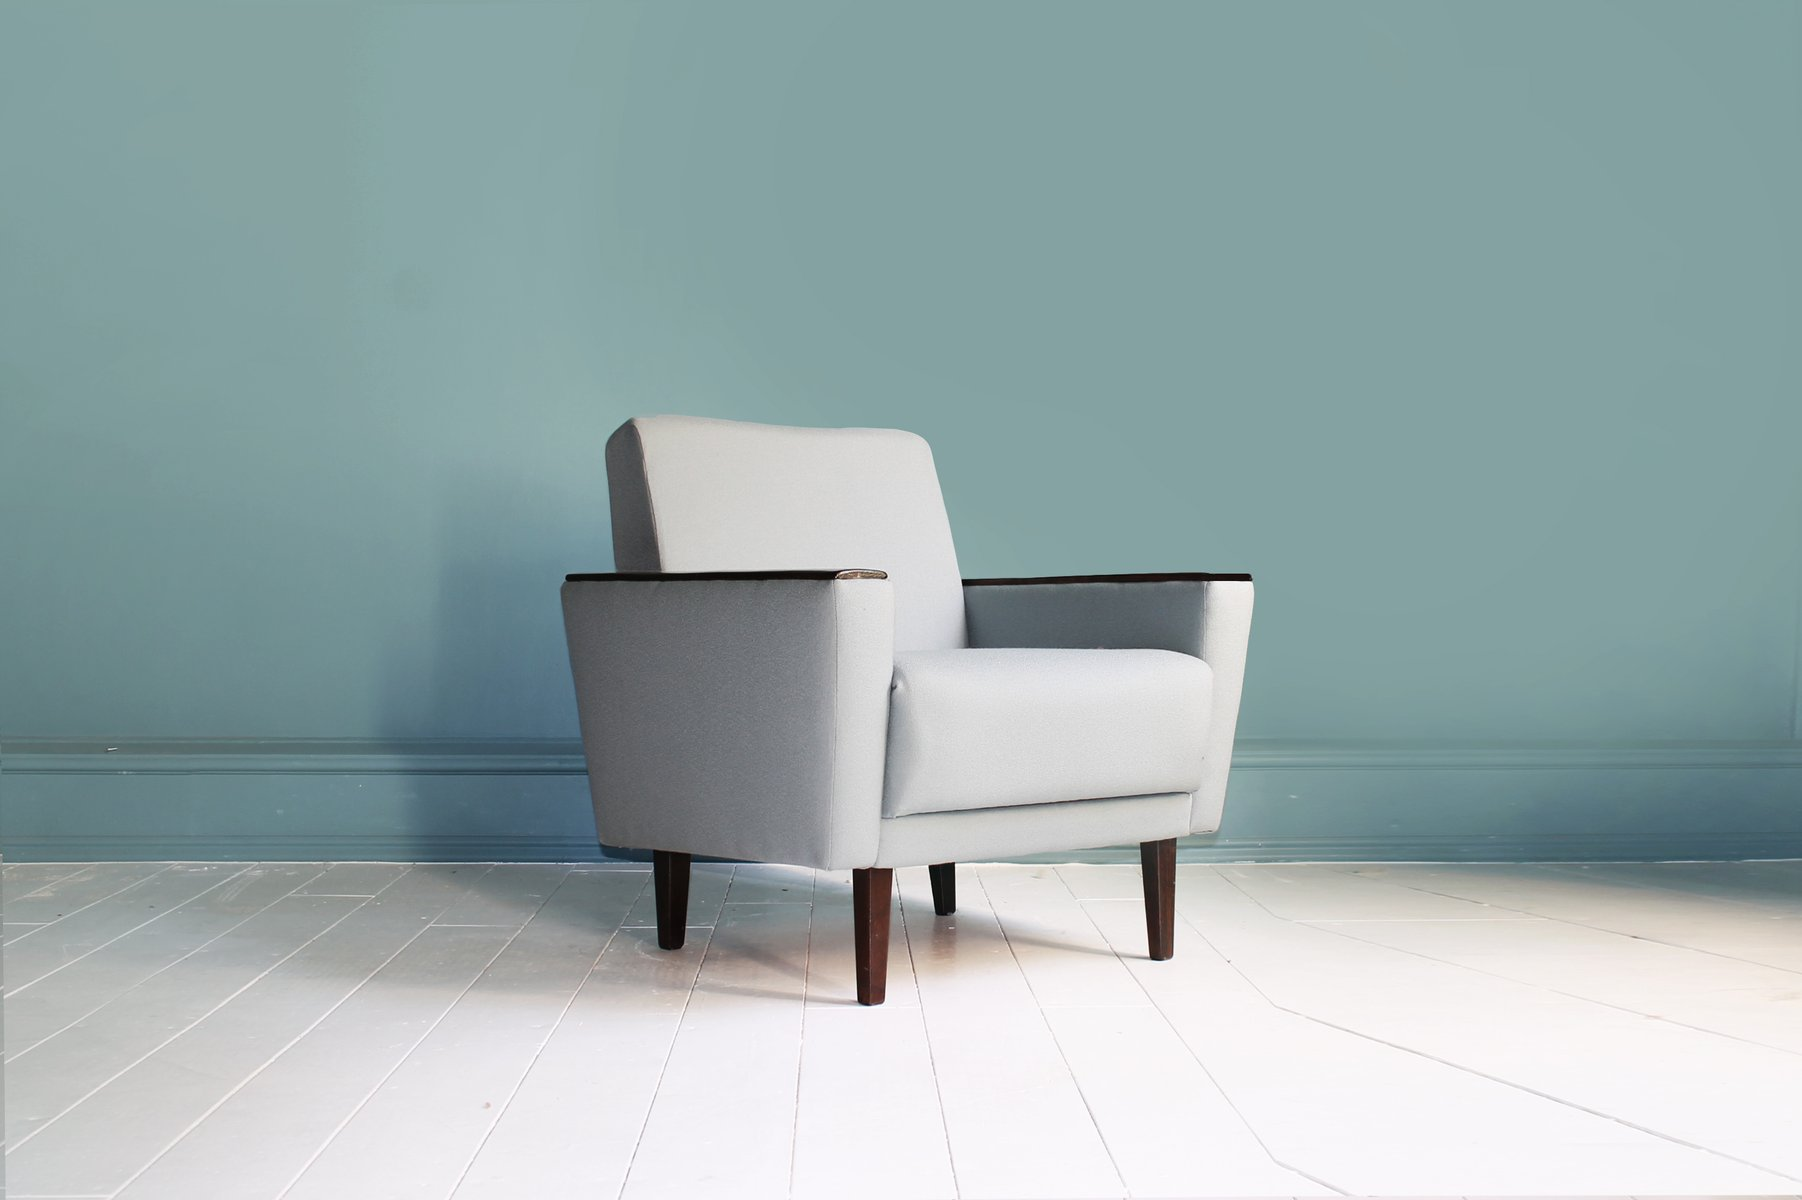 Dänische Sessel aus Naturstoff, 2er Set